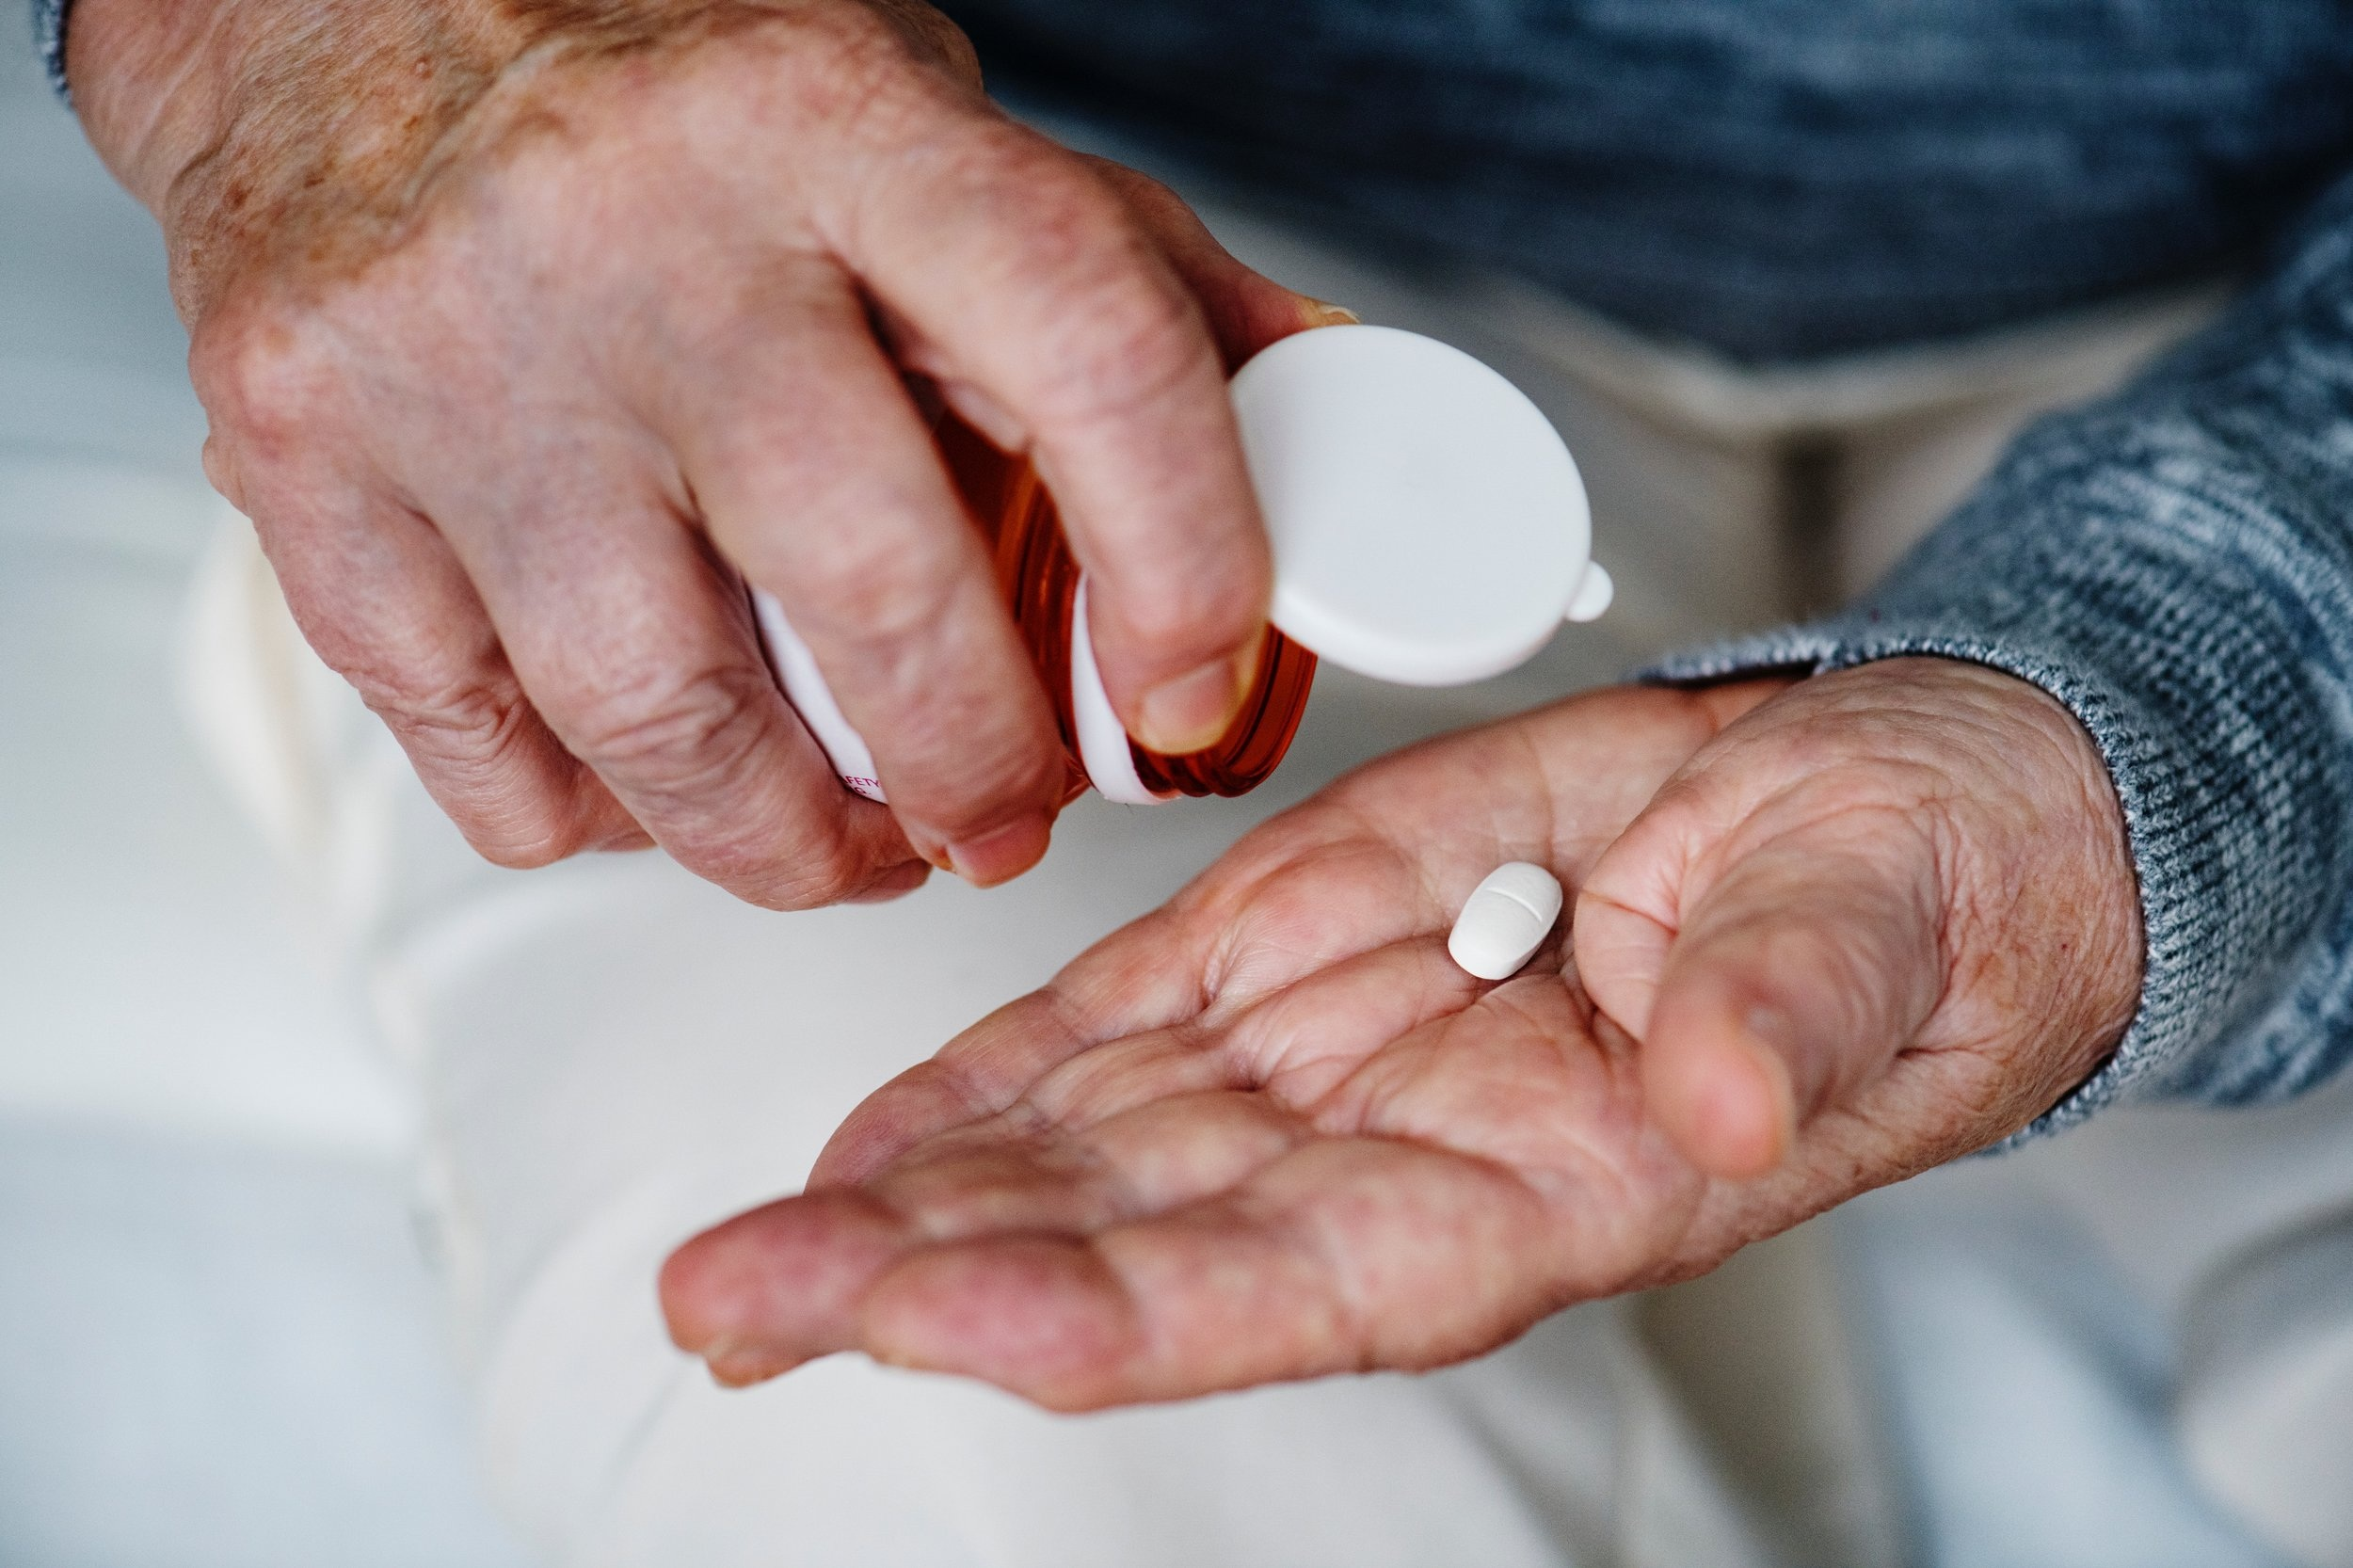 Prescriptions - No controlled substance RX